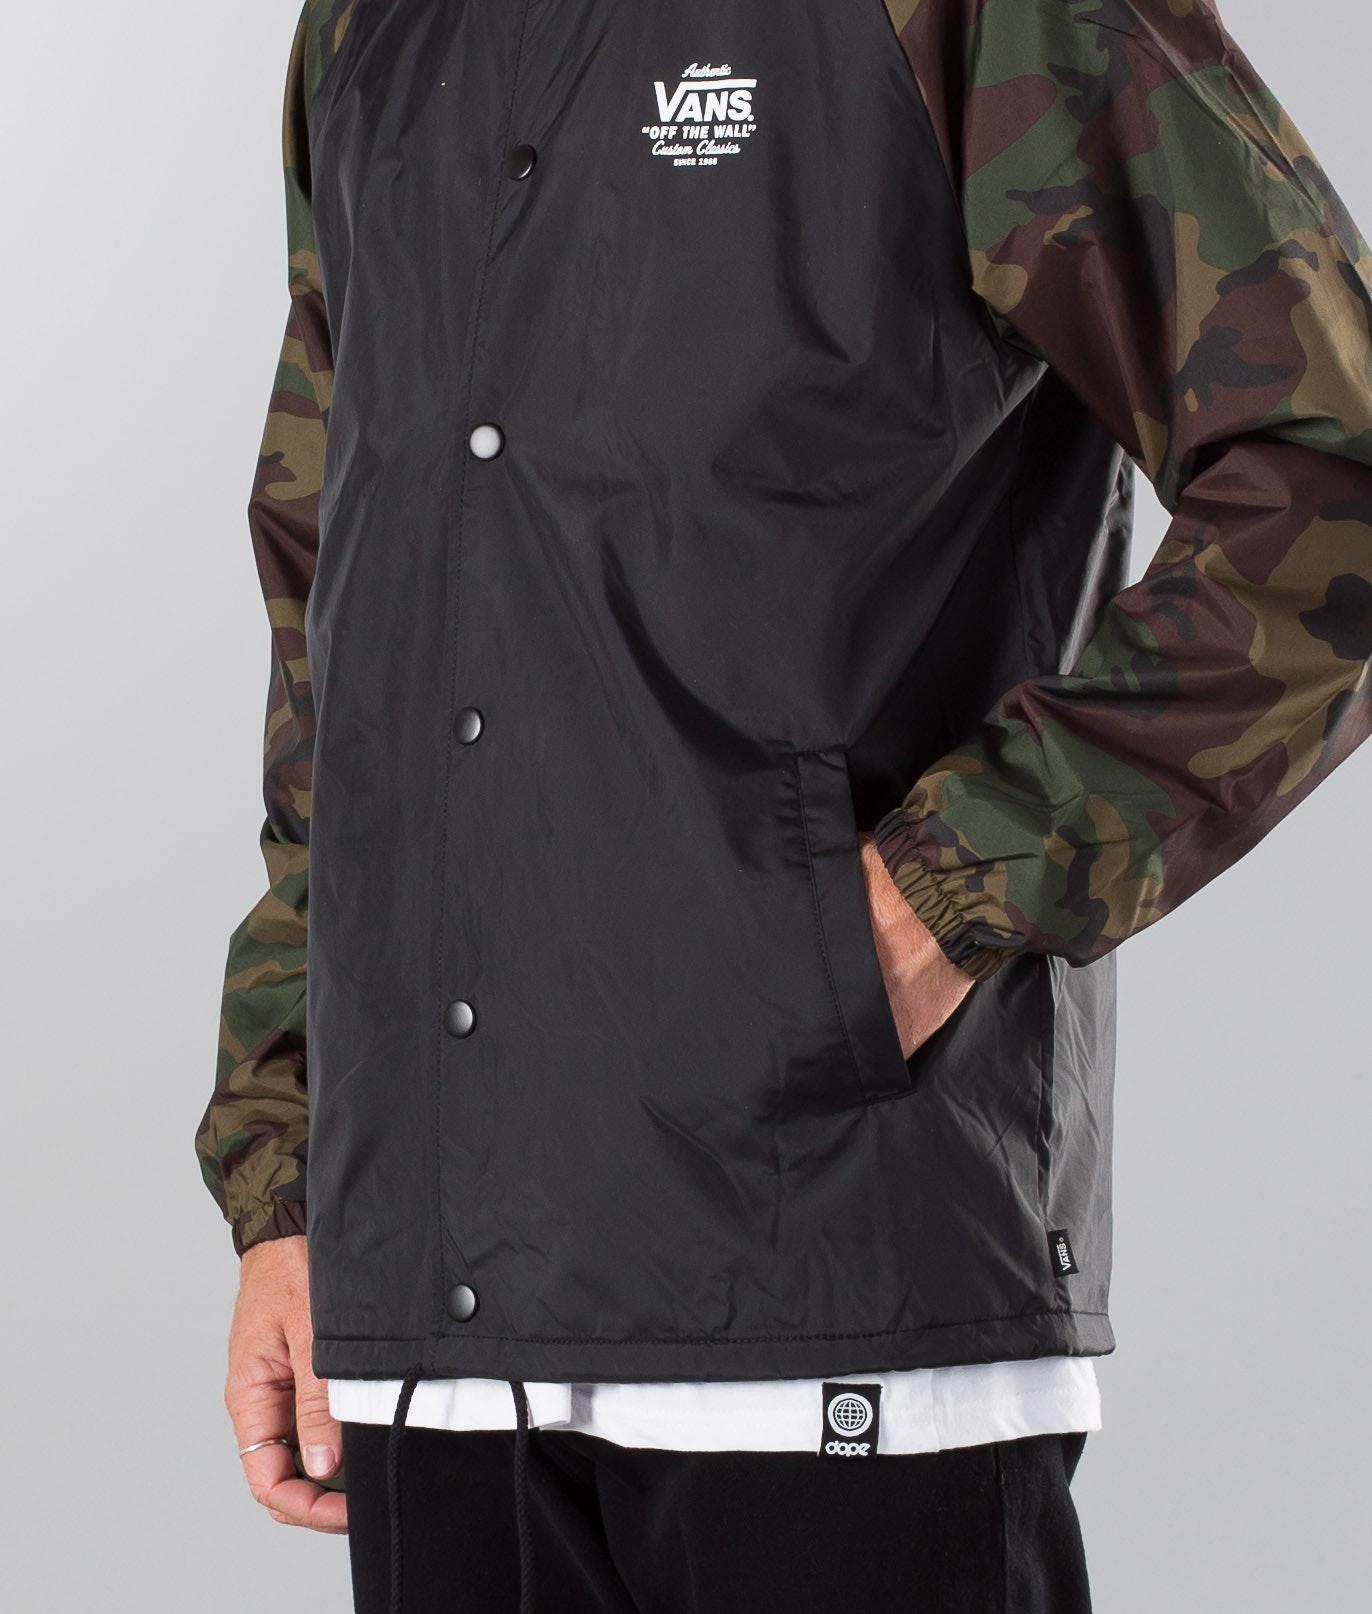 Vans Torrey Jacket Black Camo Ridestore Com